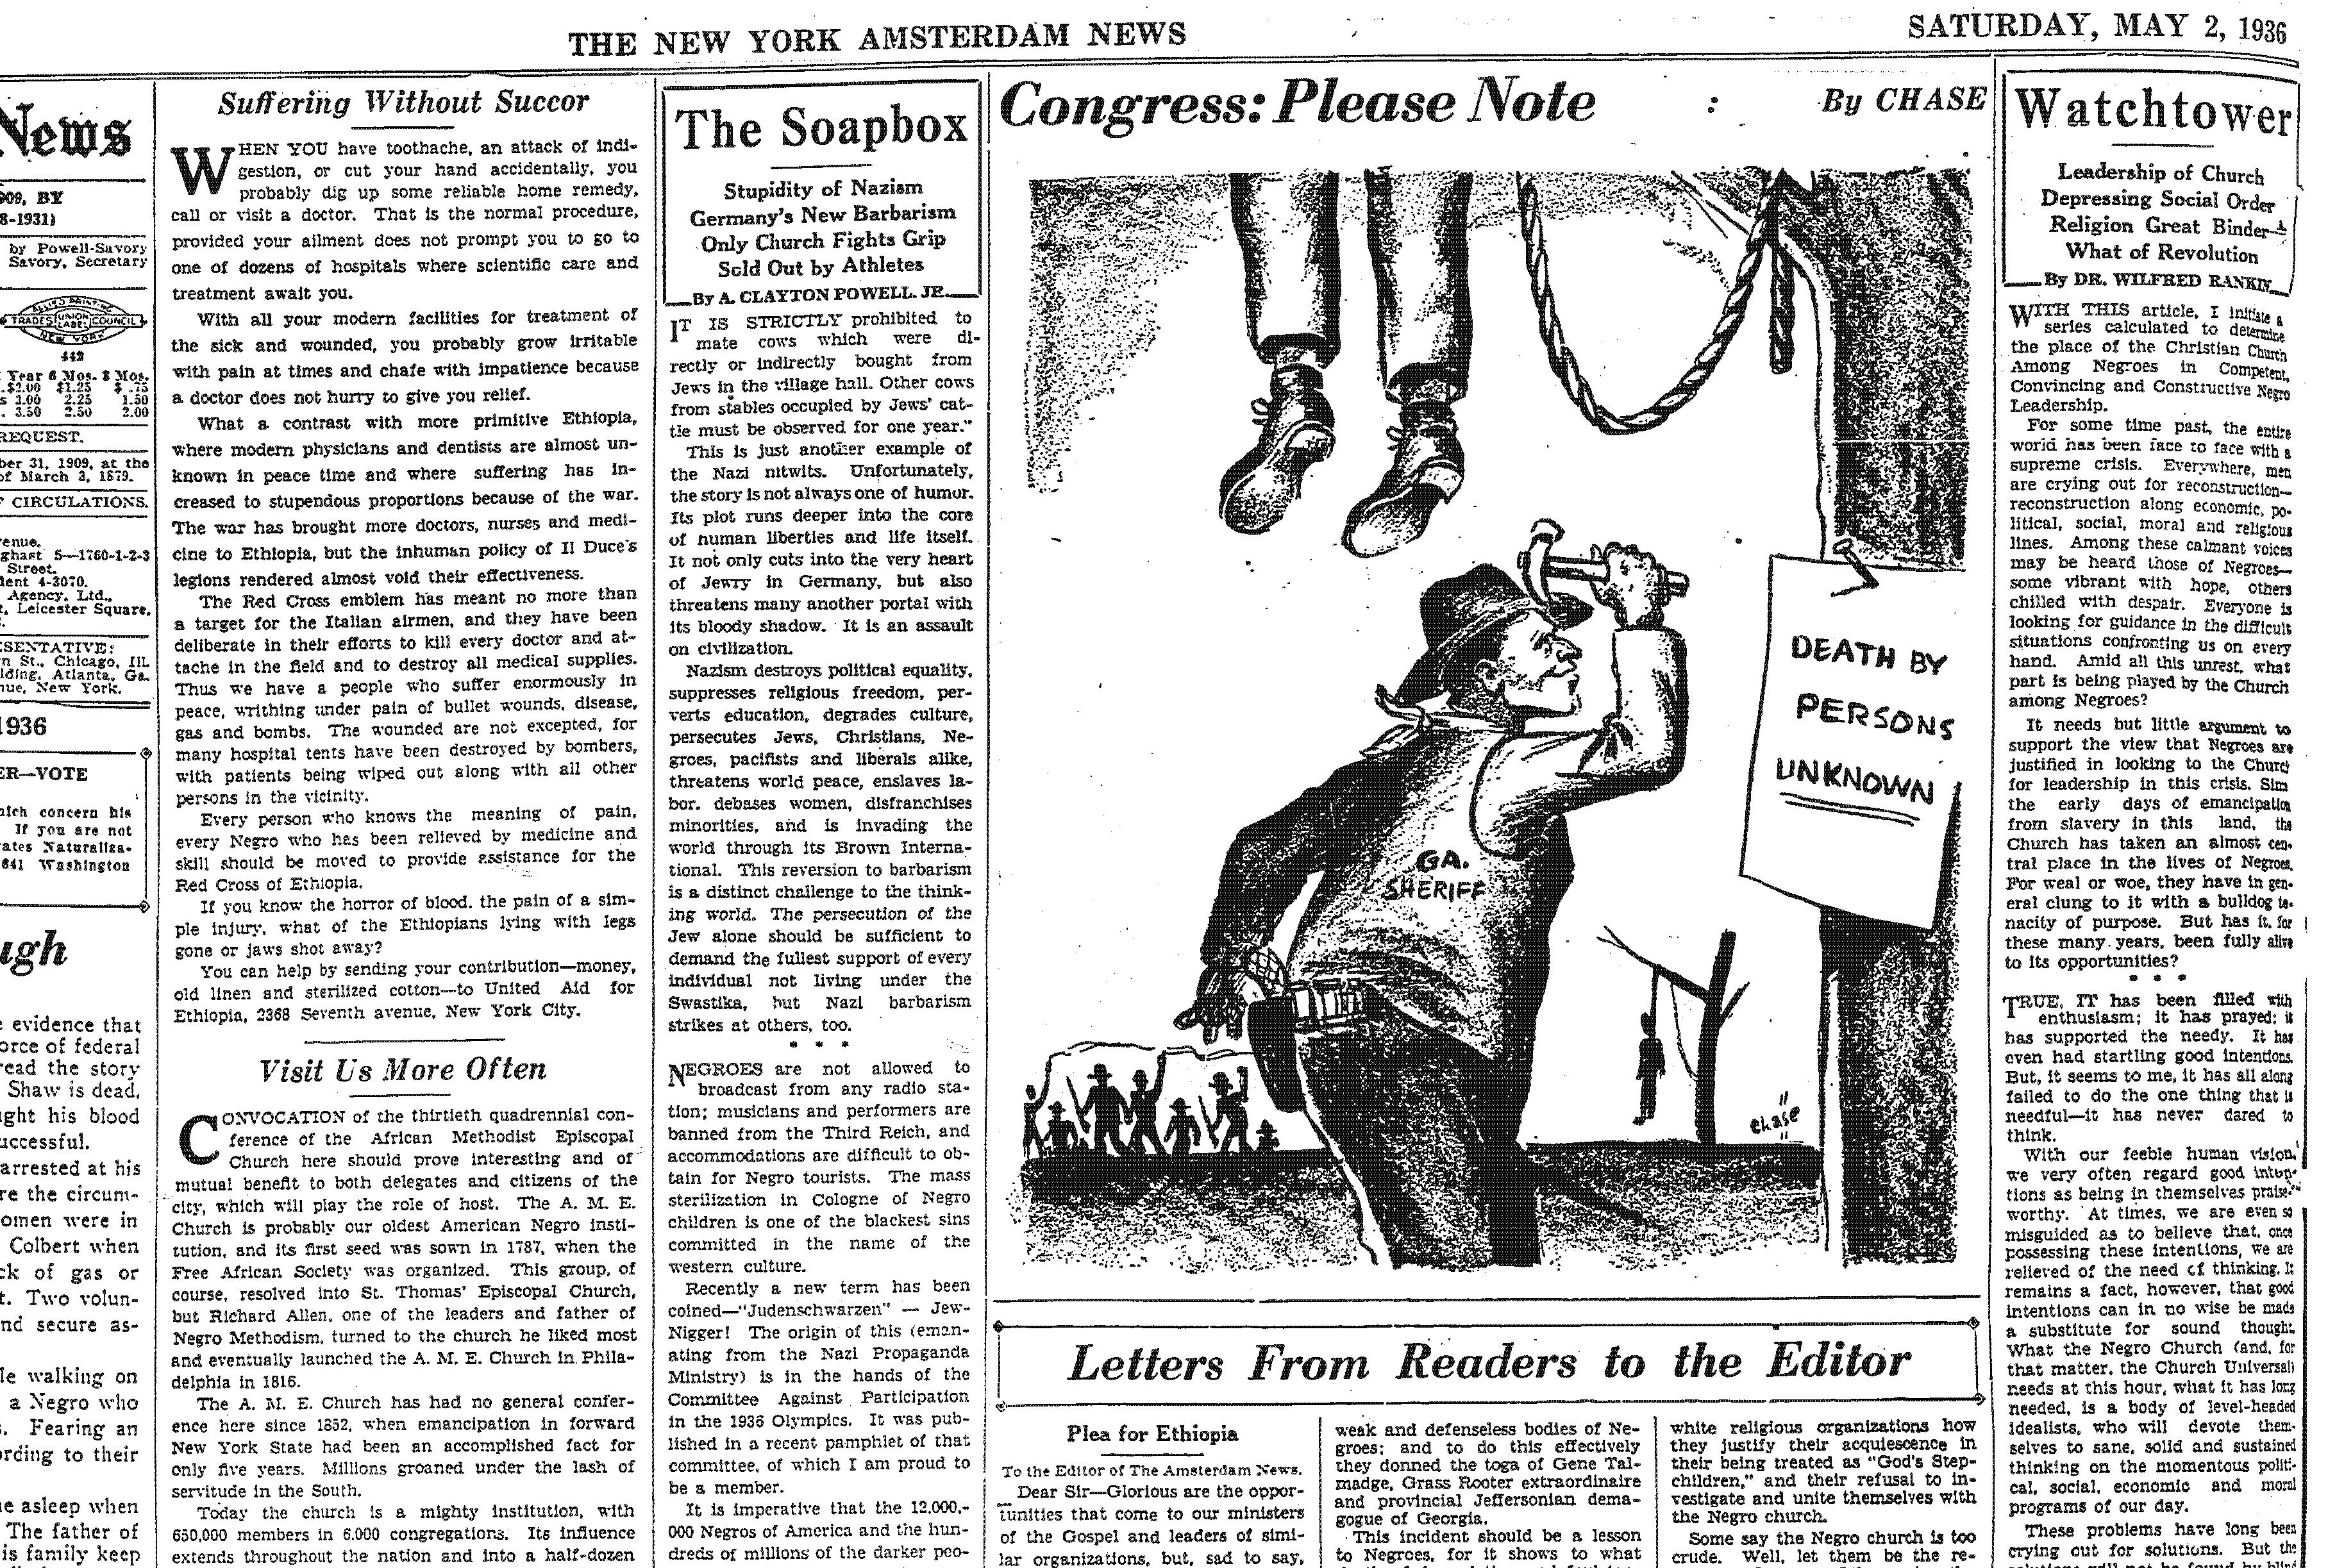 New York Amsterdam News Editorial